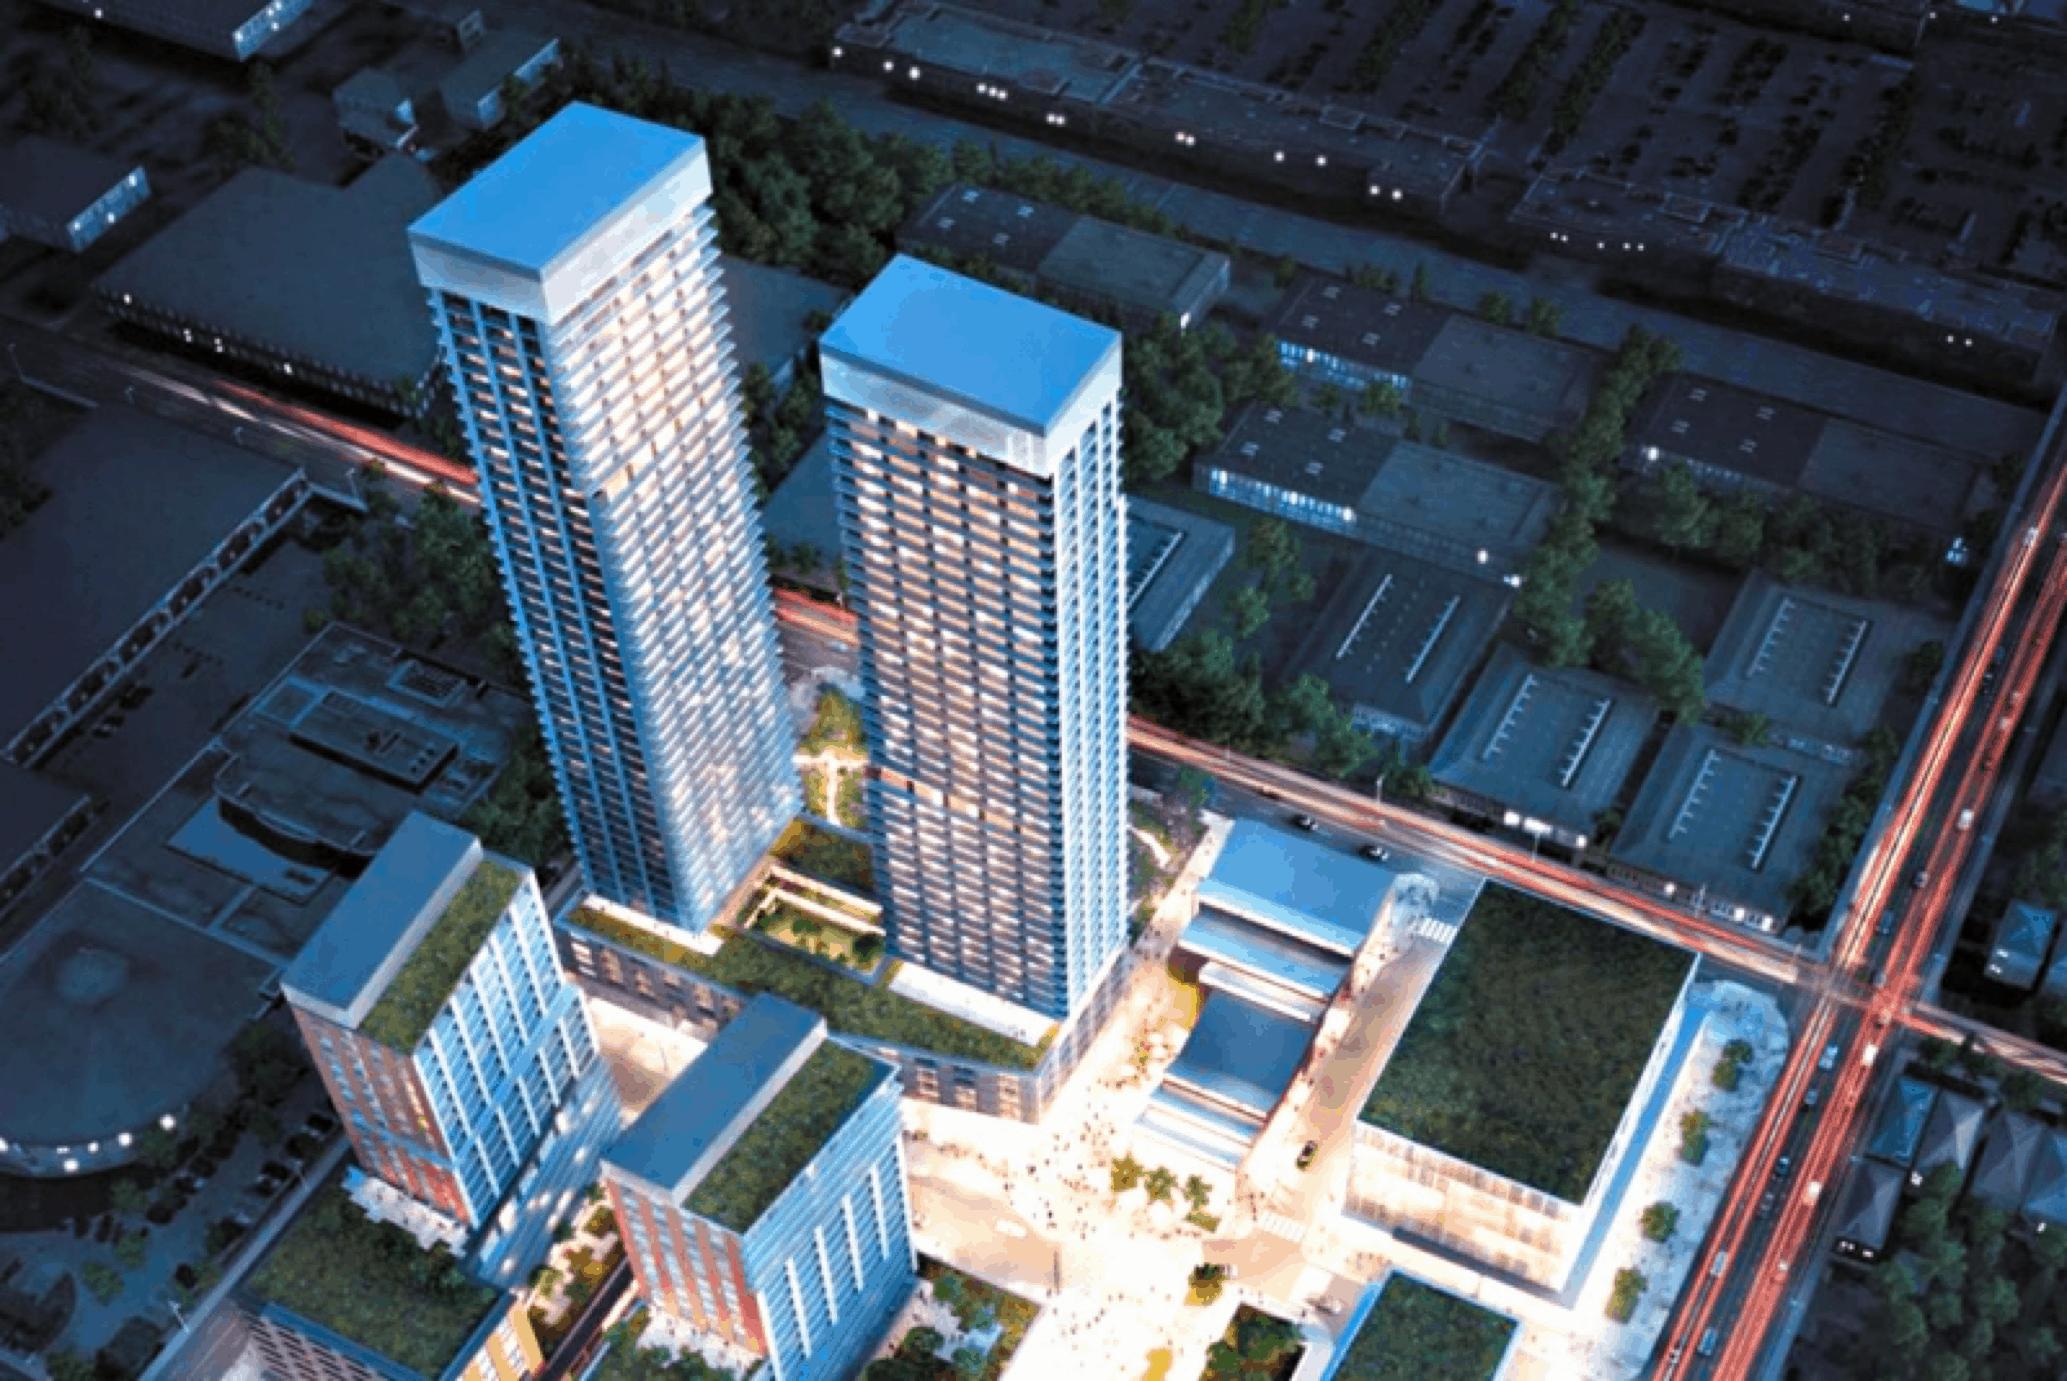 RioCan development at Laird & Eglinton